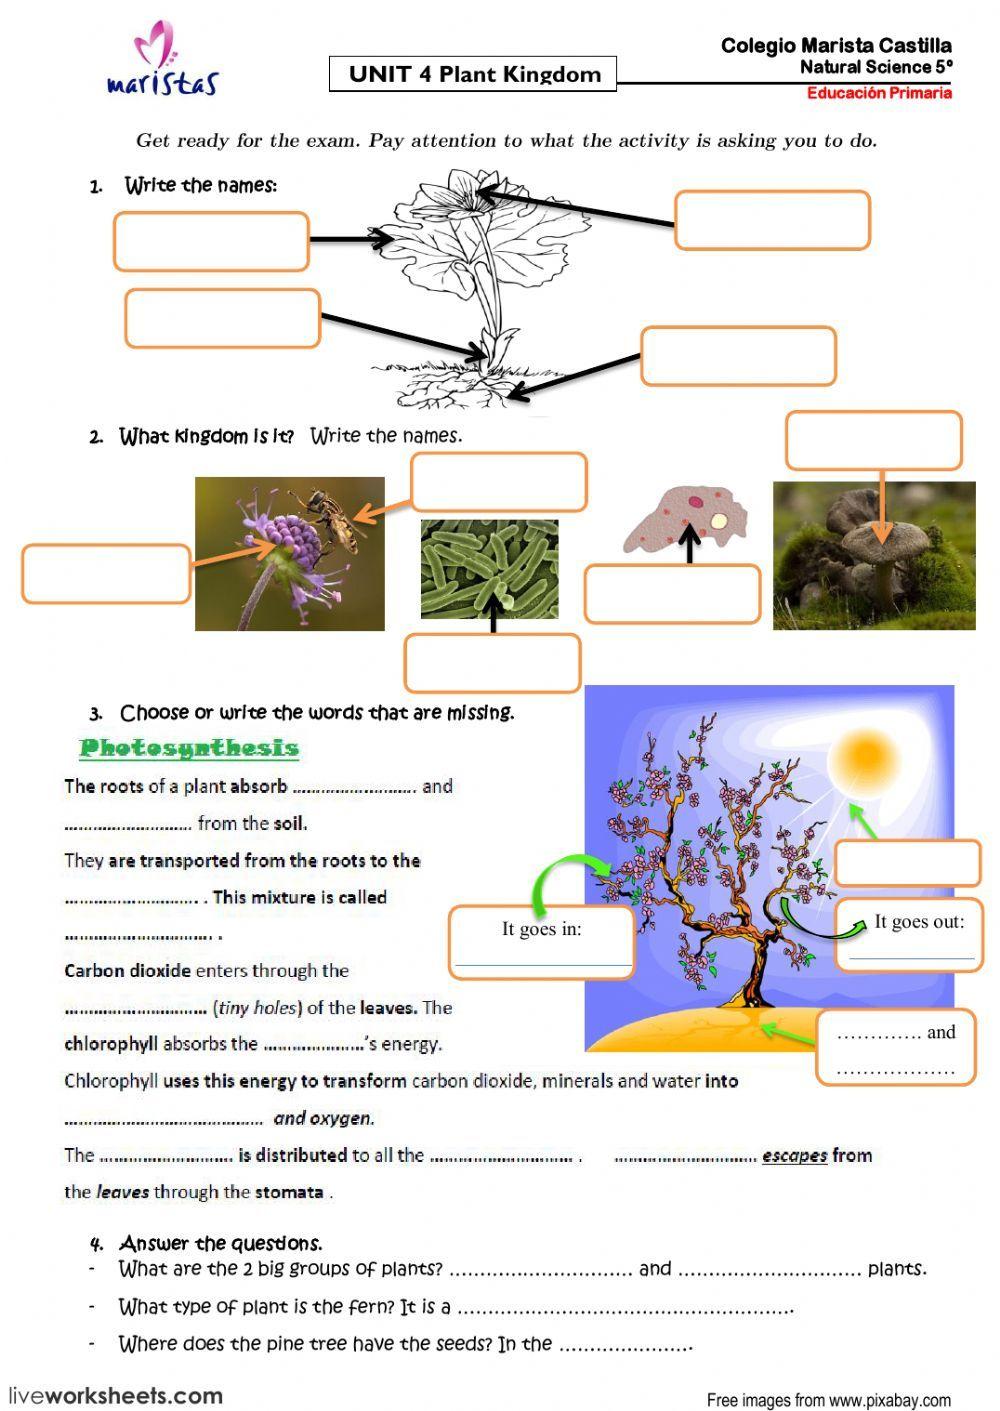 medium resolution of https://www.contohkumpulan.com/plant-kingdom-interactive-worksheet-in-2020-science-and-nature-plants-worksheets/